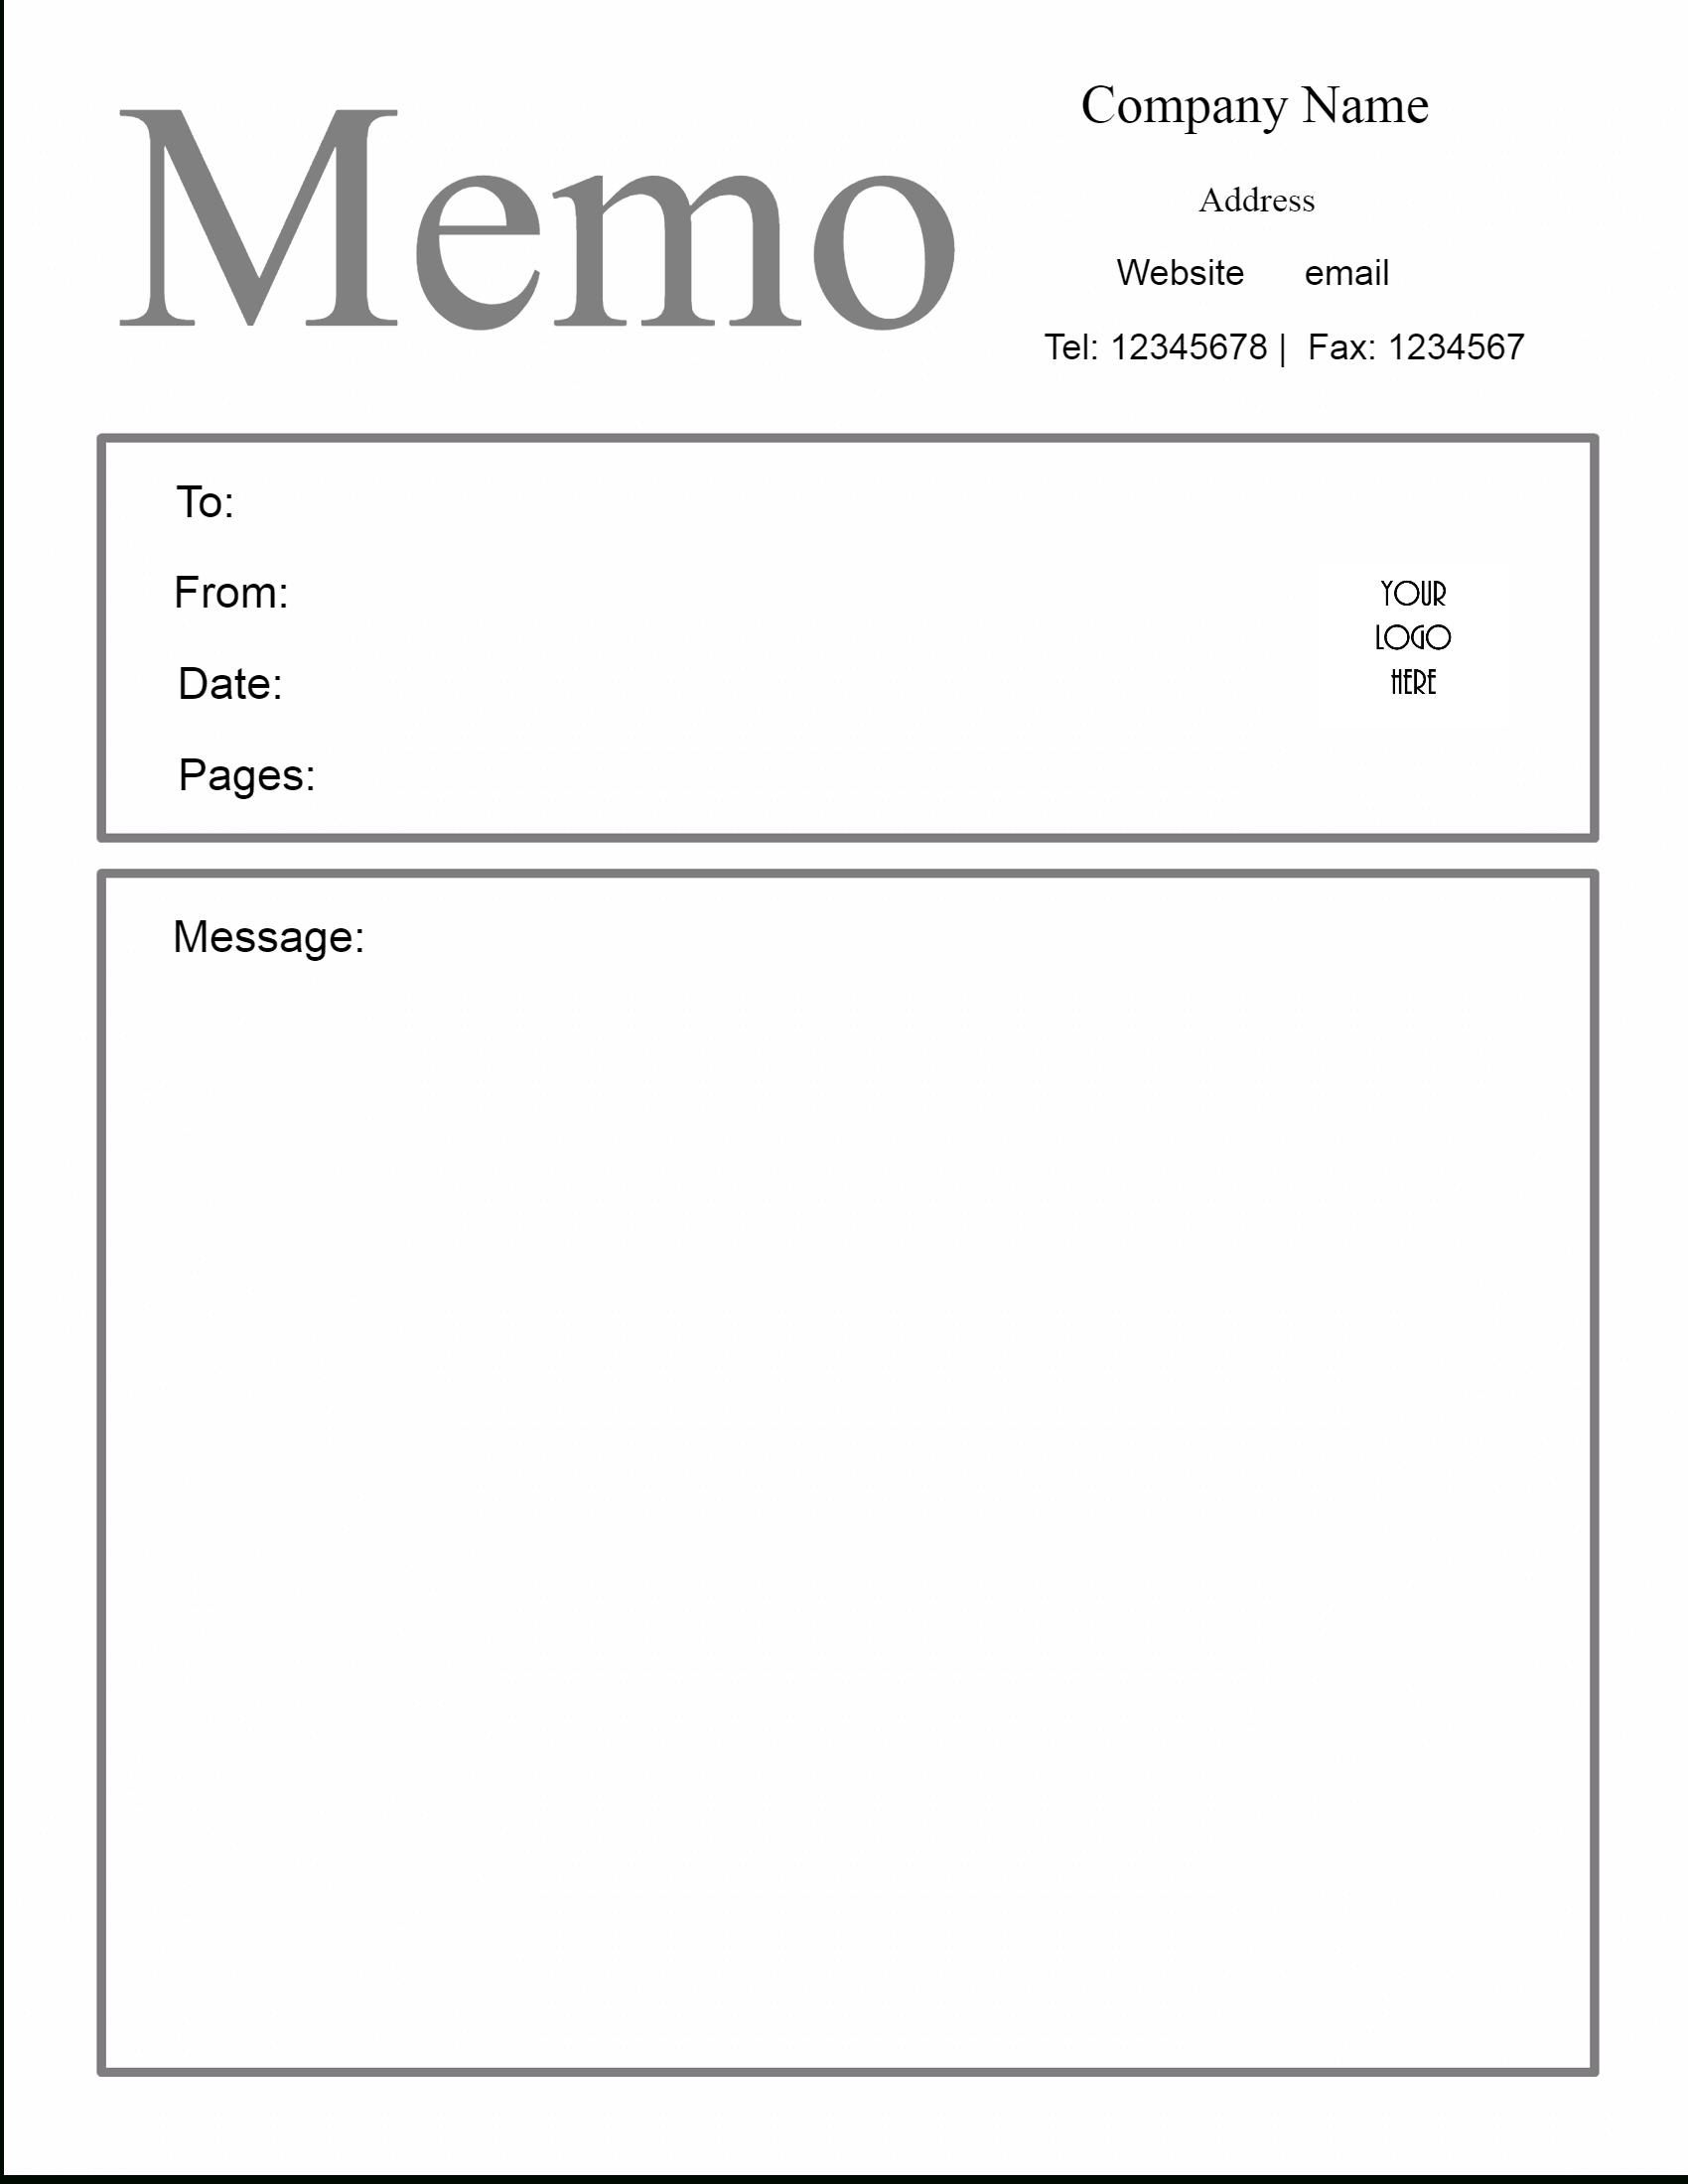 Memo Template Google Docs | Business Template